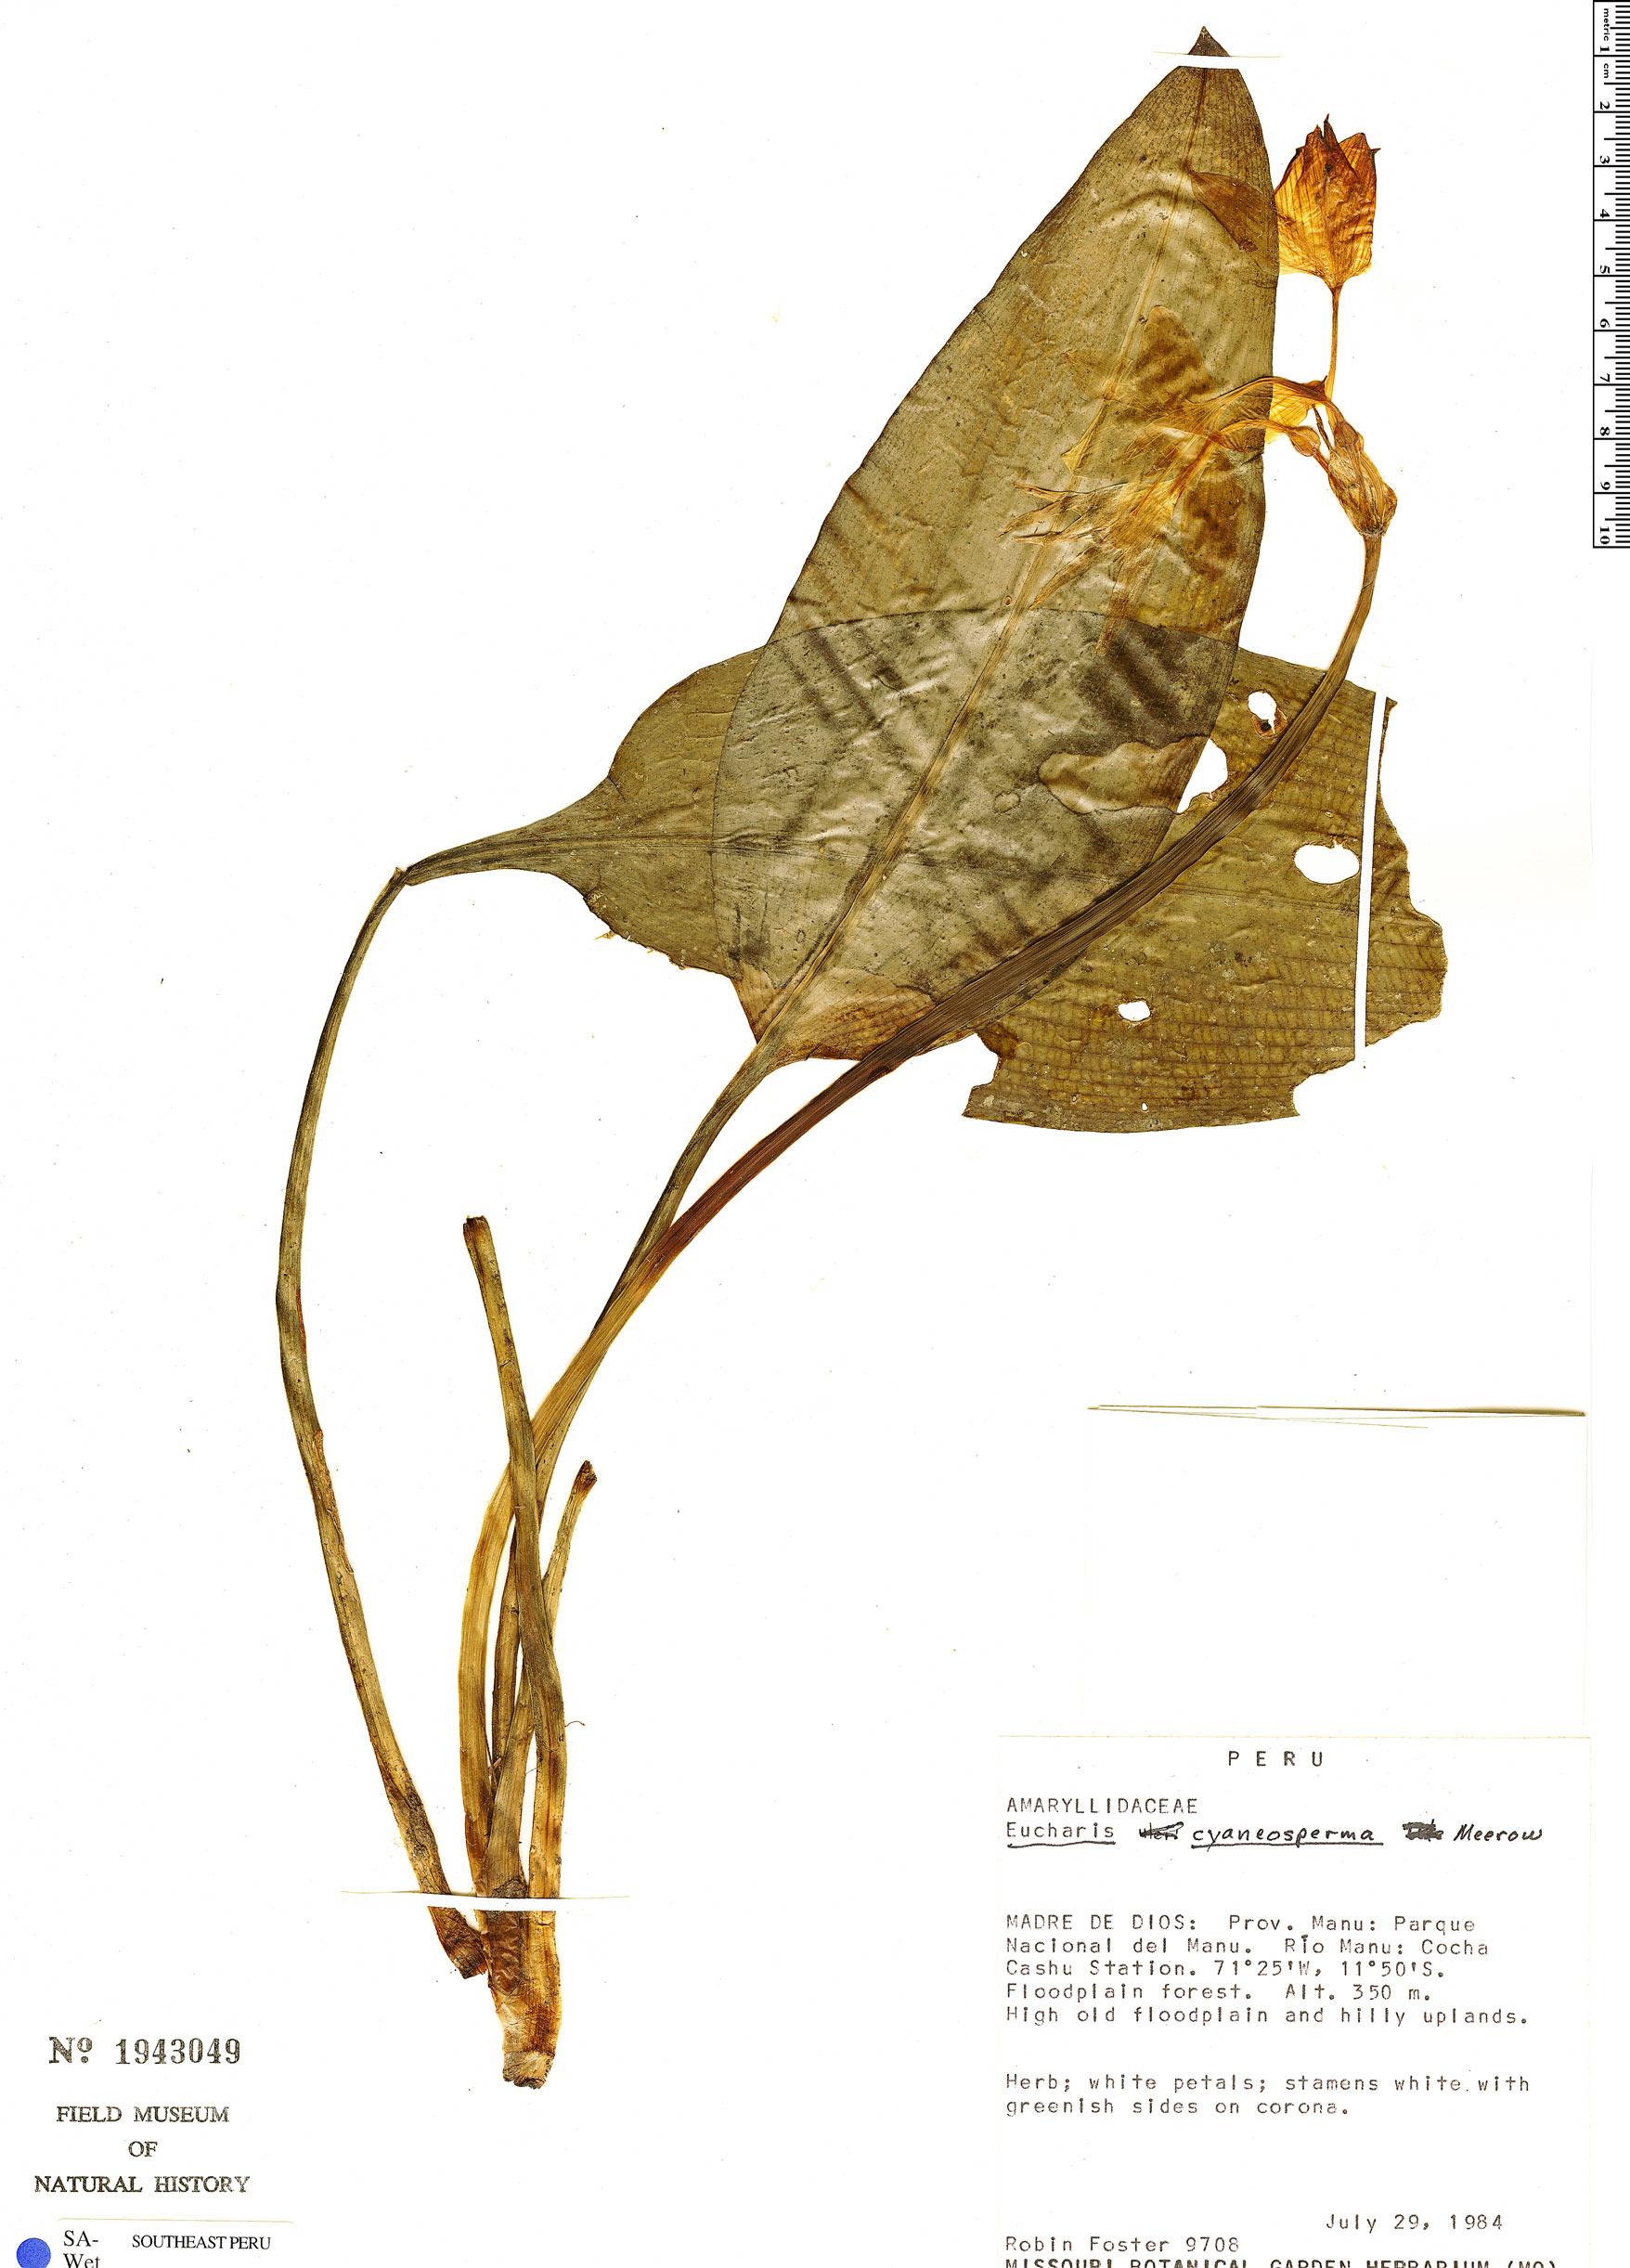 Specimen: Eucharis cyaneosperma